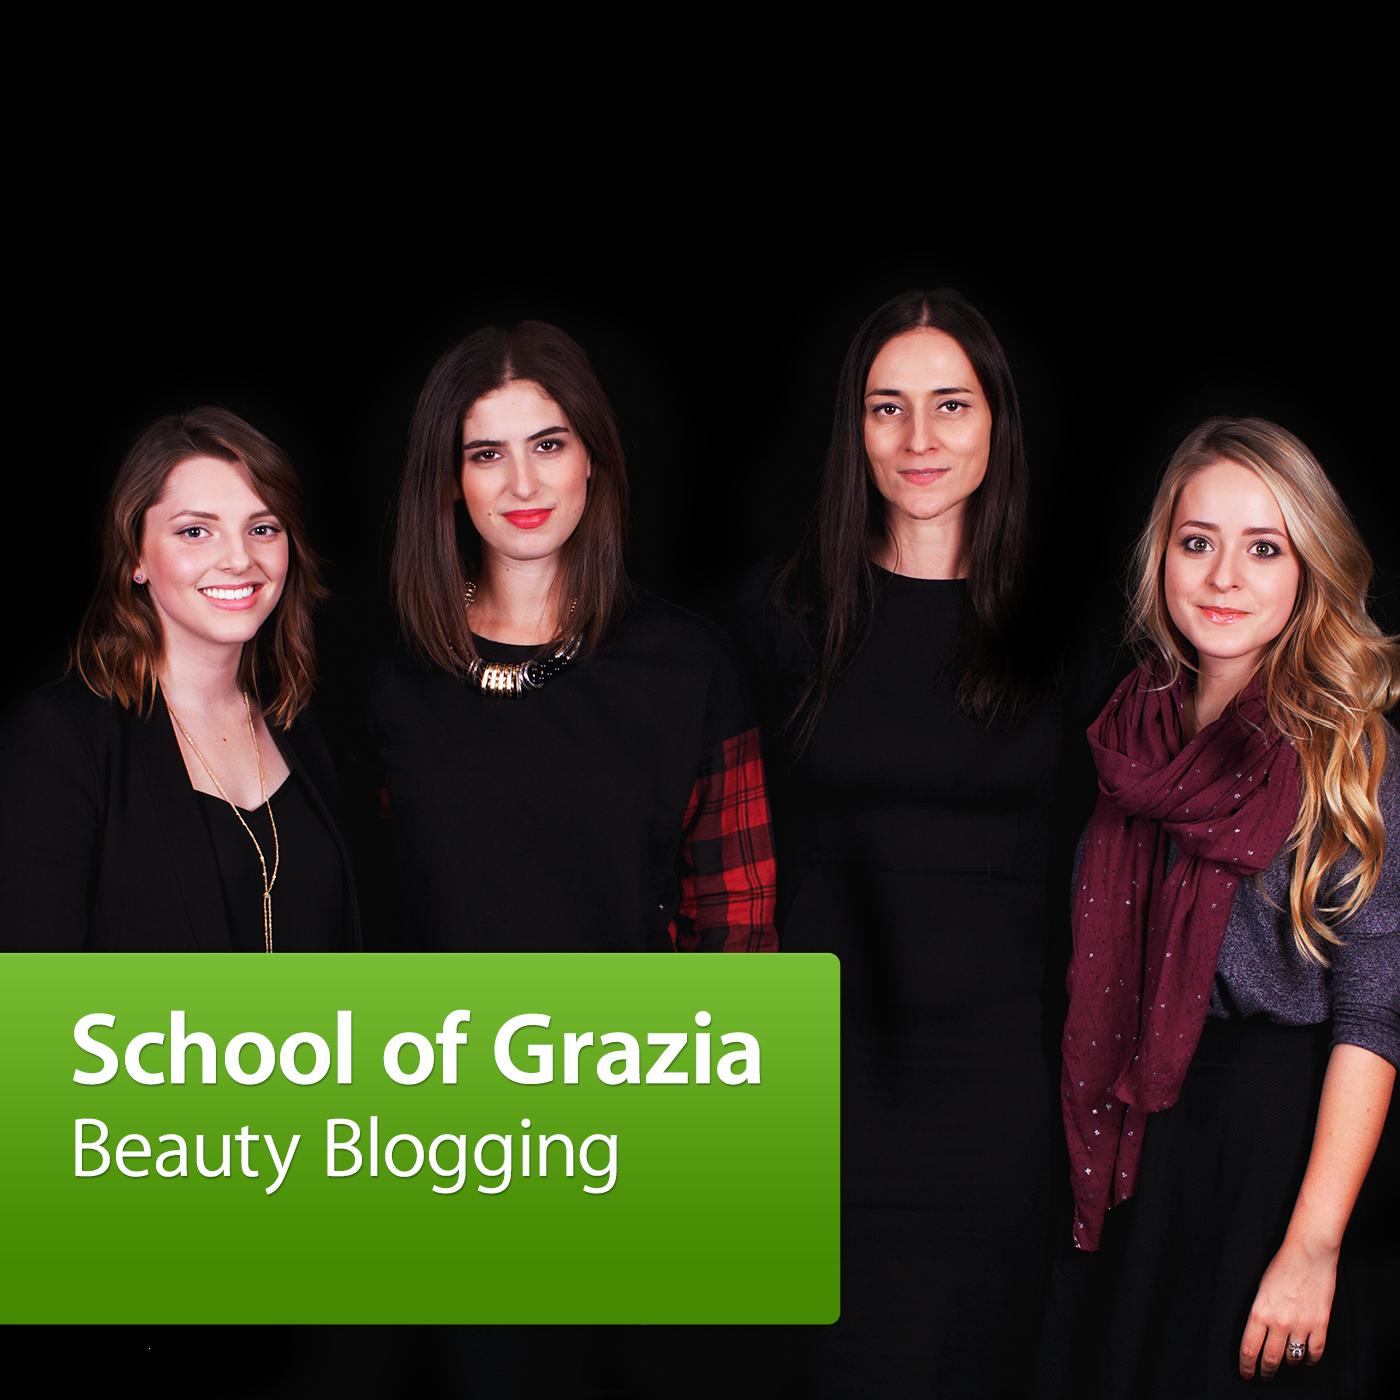 School of Grazia: Beauty Blogging